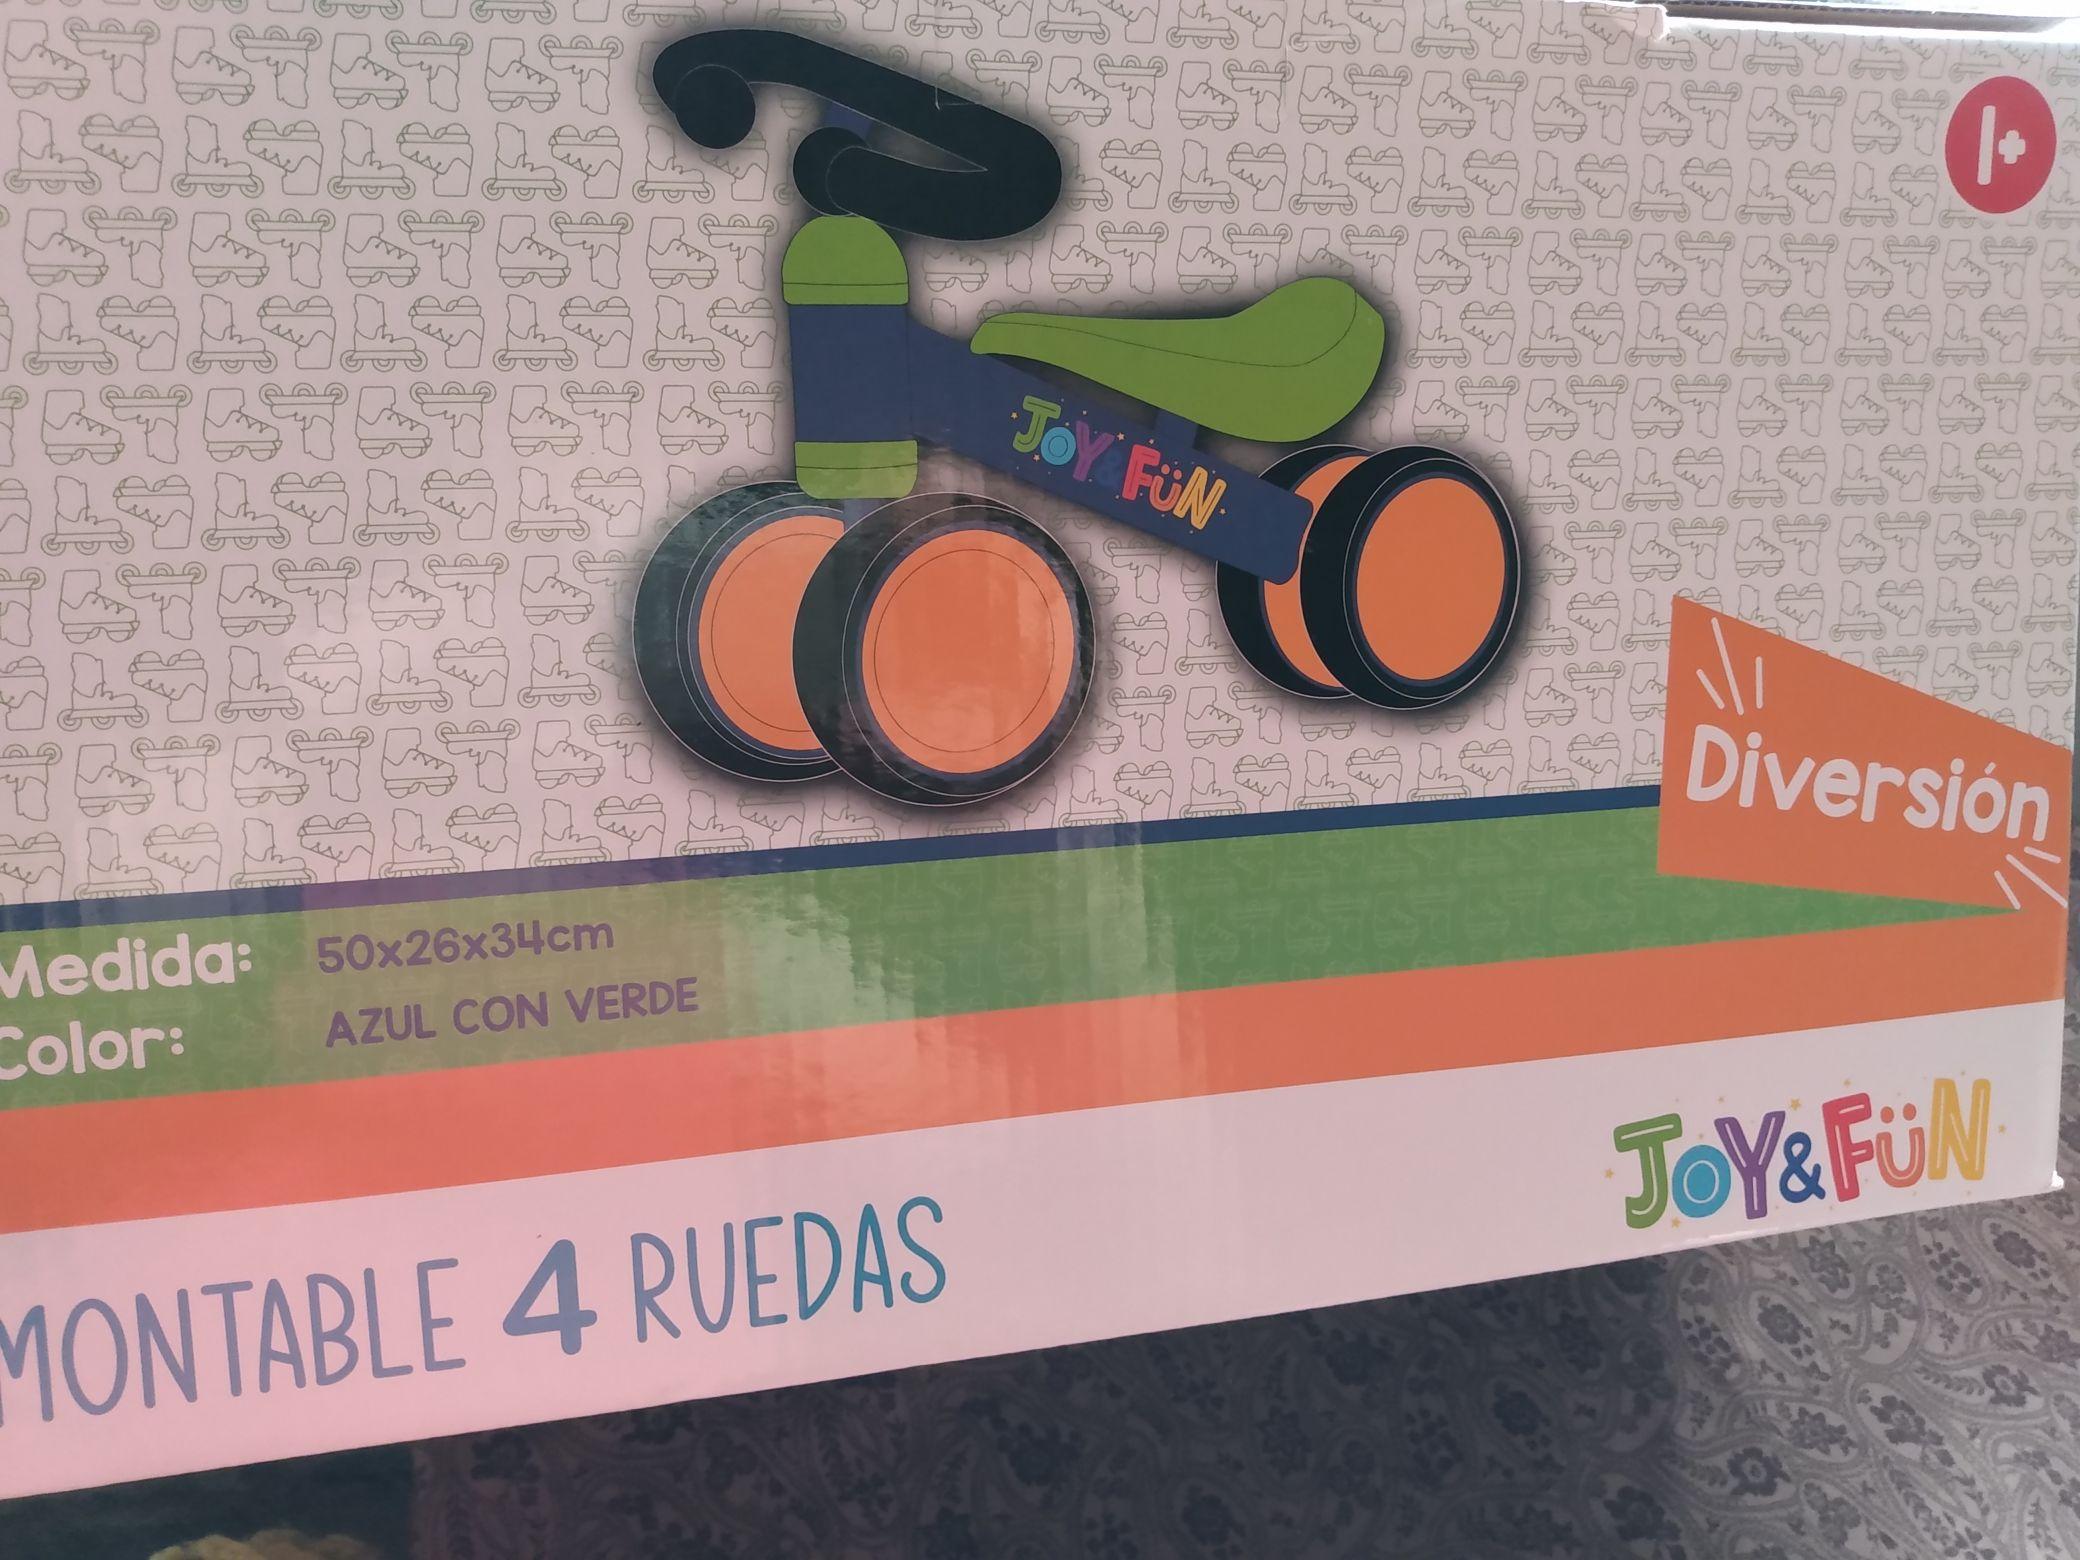 Chedraui : montable 4 ruedas joy fun